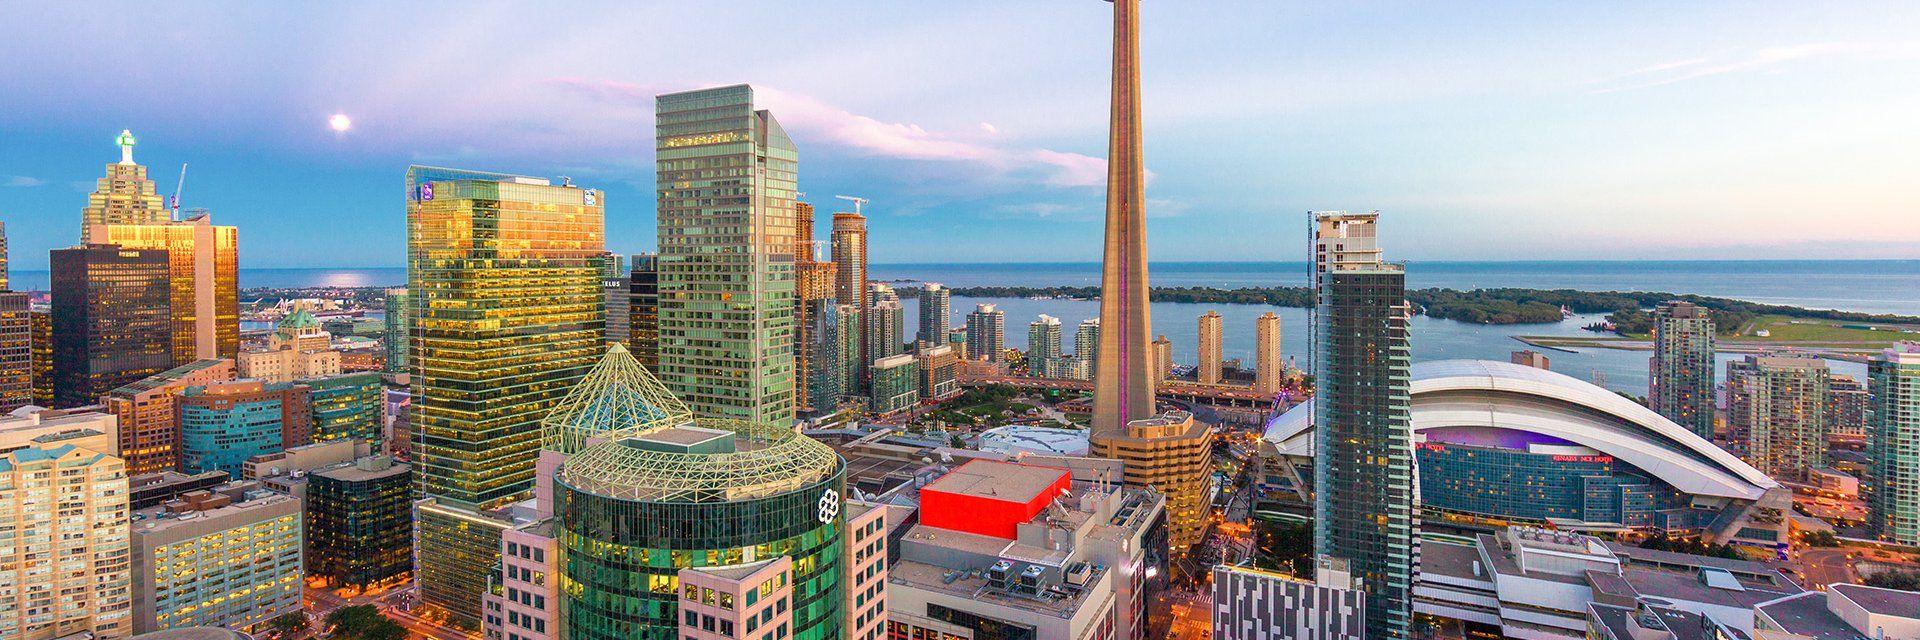 Carte Assurance Maladie Toronto.Sejour Urbain A Toronto Groupe Voyages Quebec Leader De